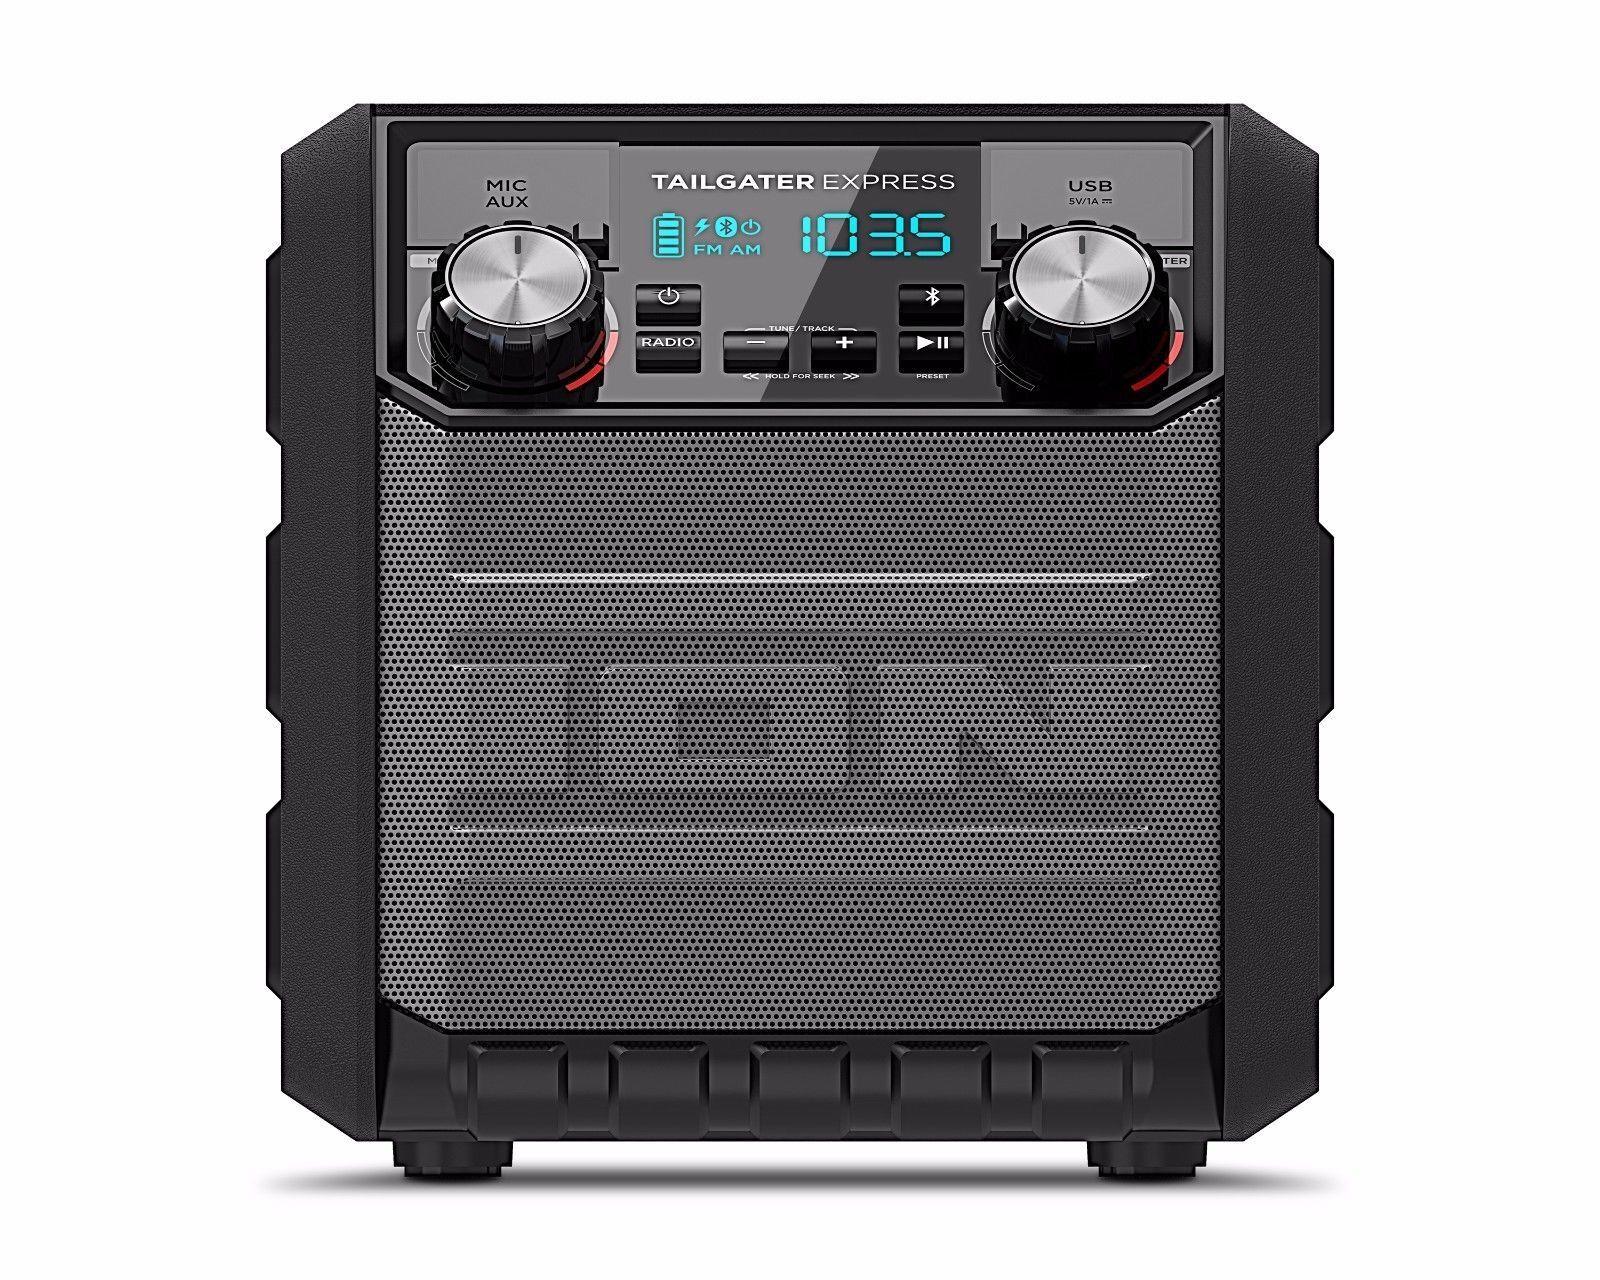 ION - Tailgater Express Portable Bluetooth Speaker - Black